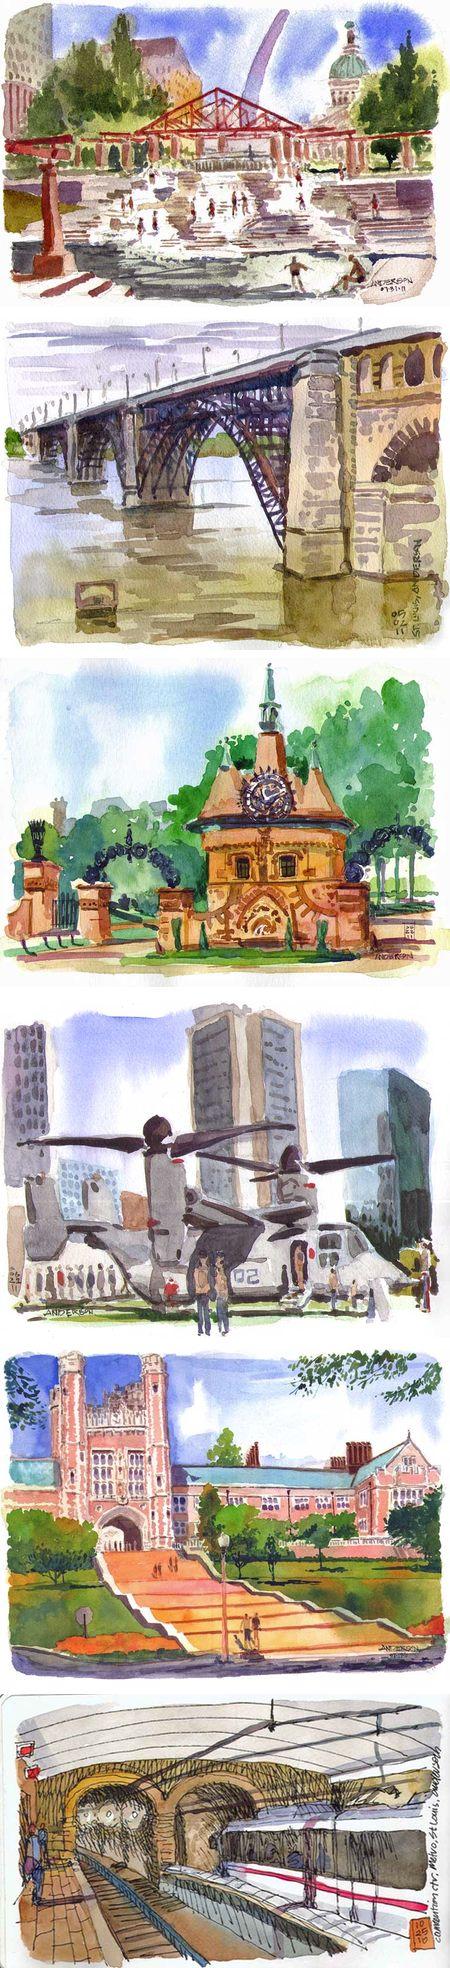 Sketching St. Louis - Michael Anderson